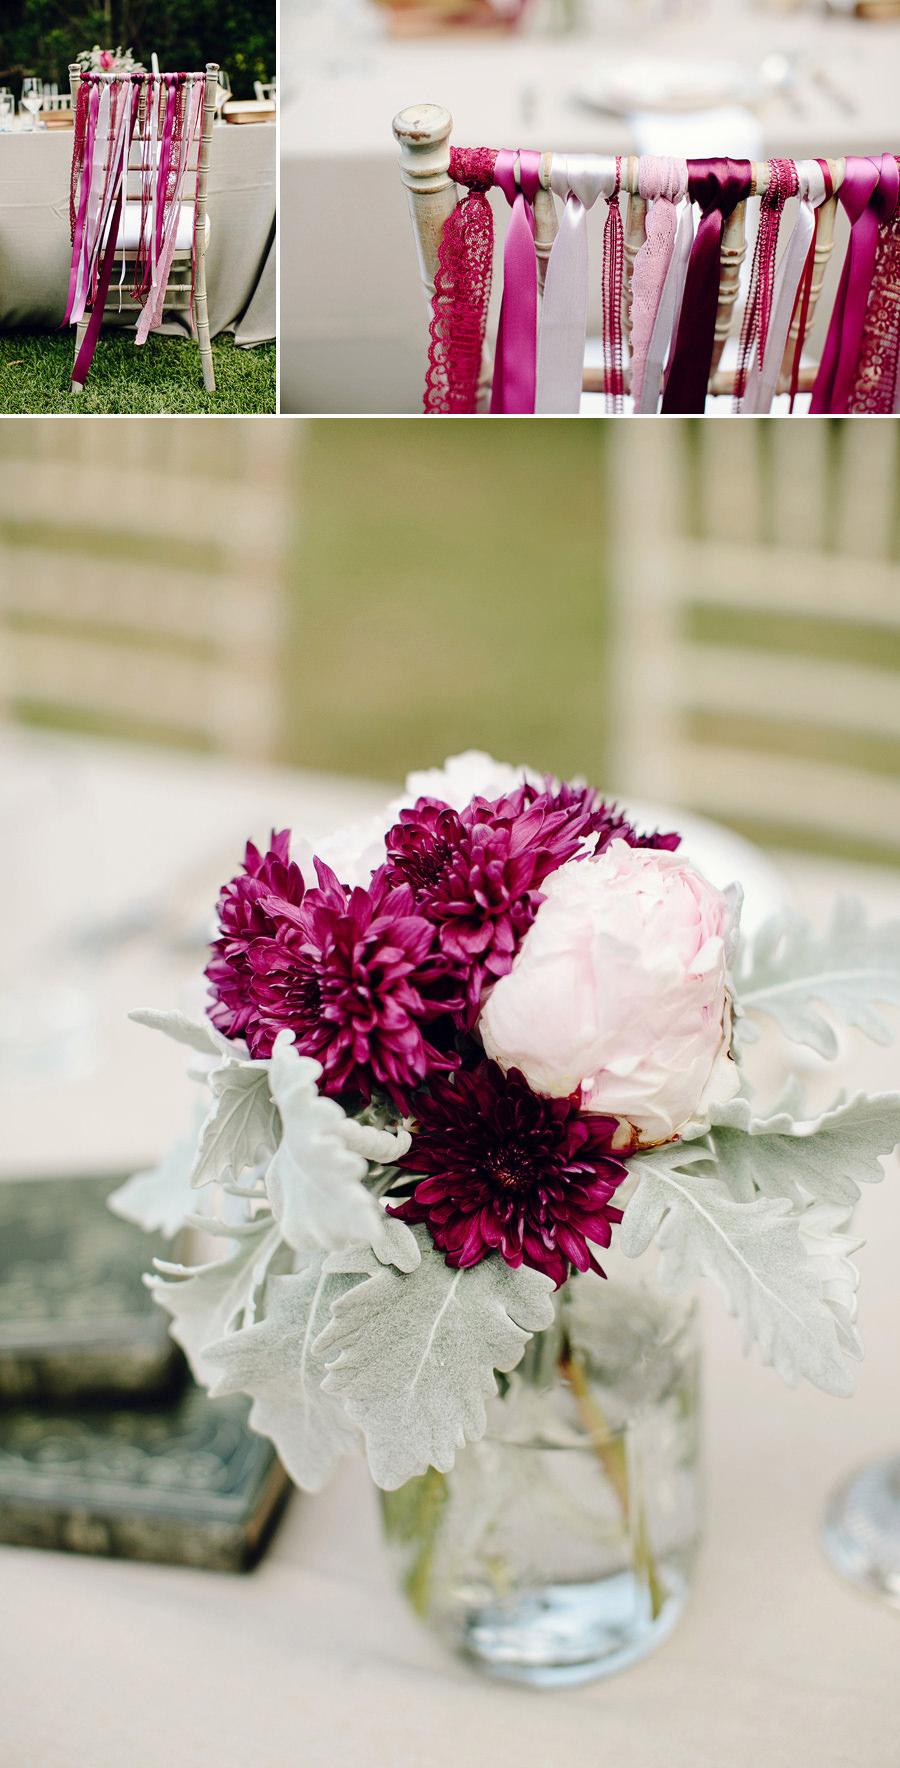 Central Coast Birthday Photographer: Floral arrangements